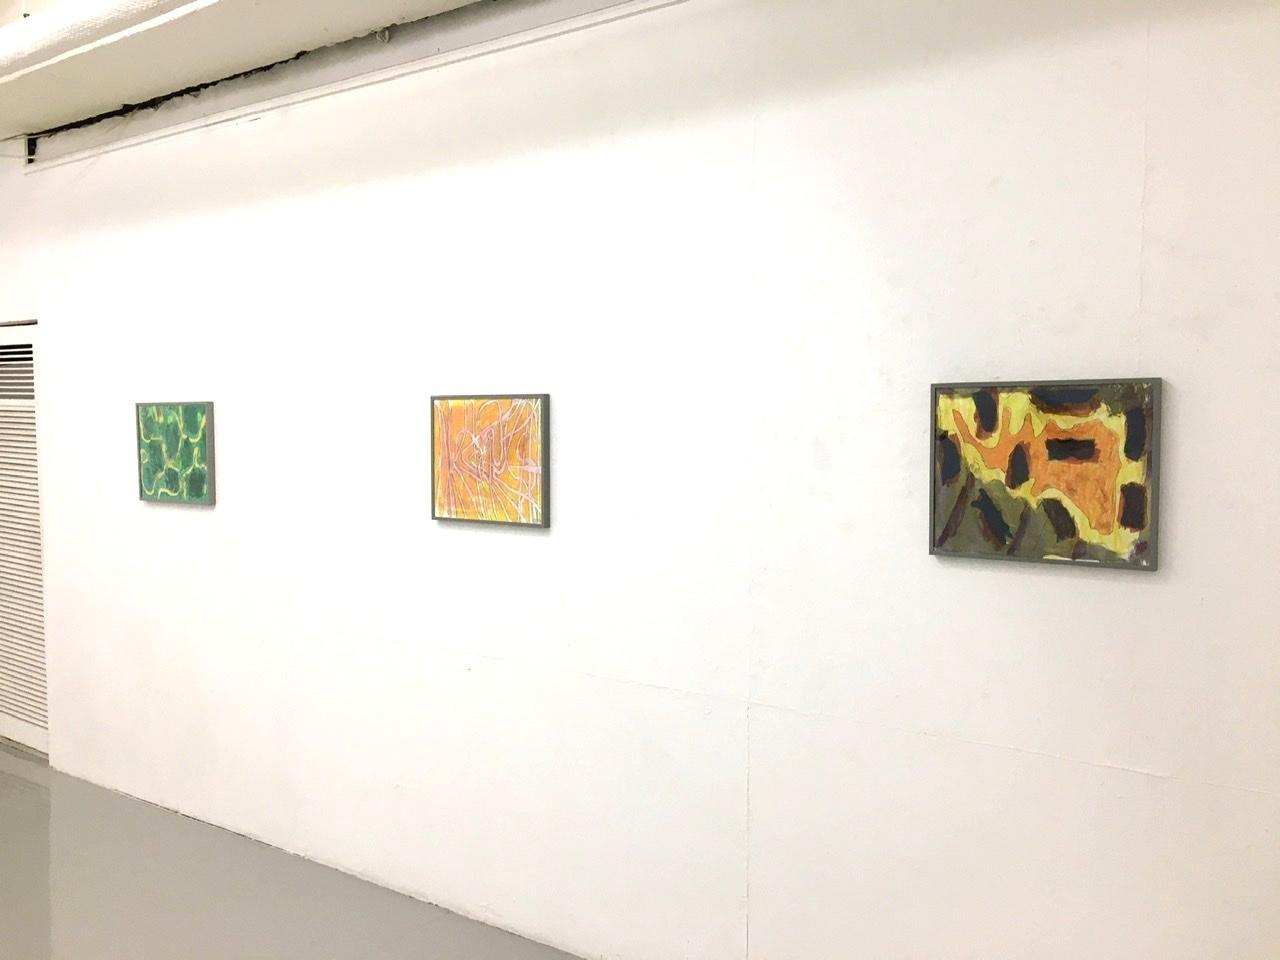 赤塚祐二&伊藤誠展/Yuji AKATSUKA & Makoto ITO exhibition_d0271004_00145225.jpeg